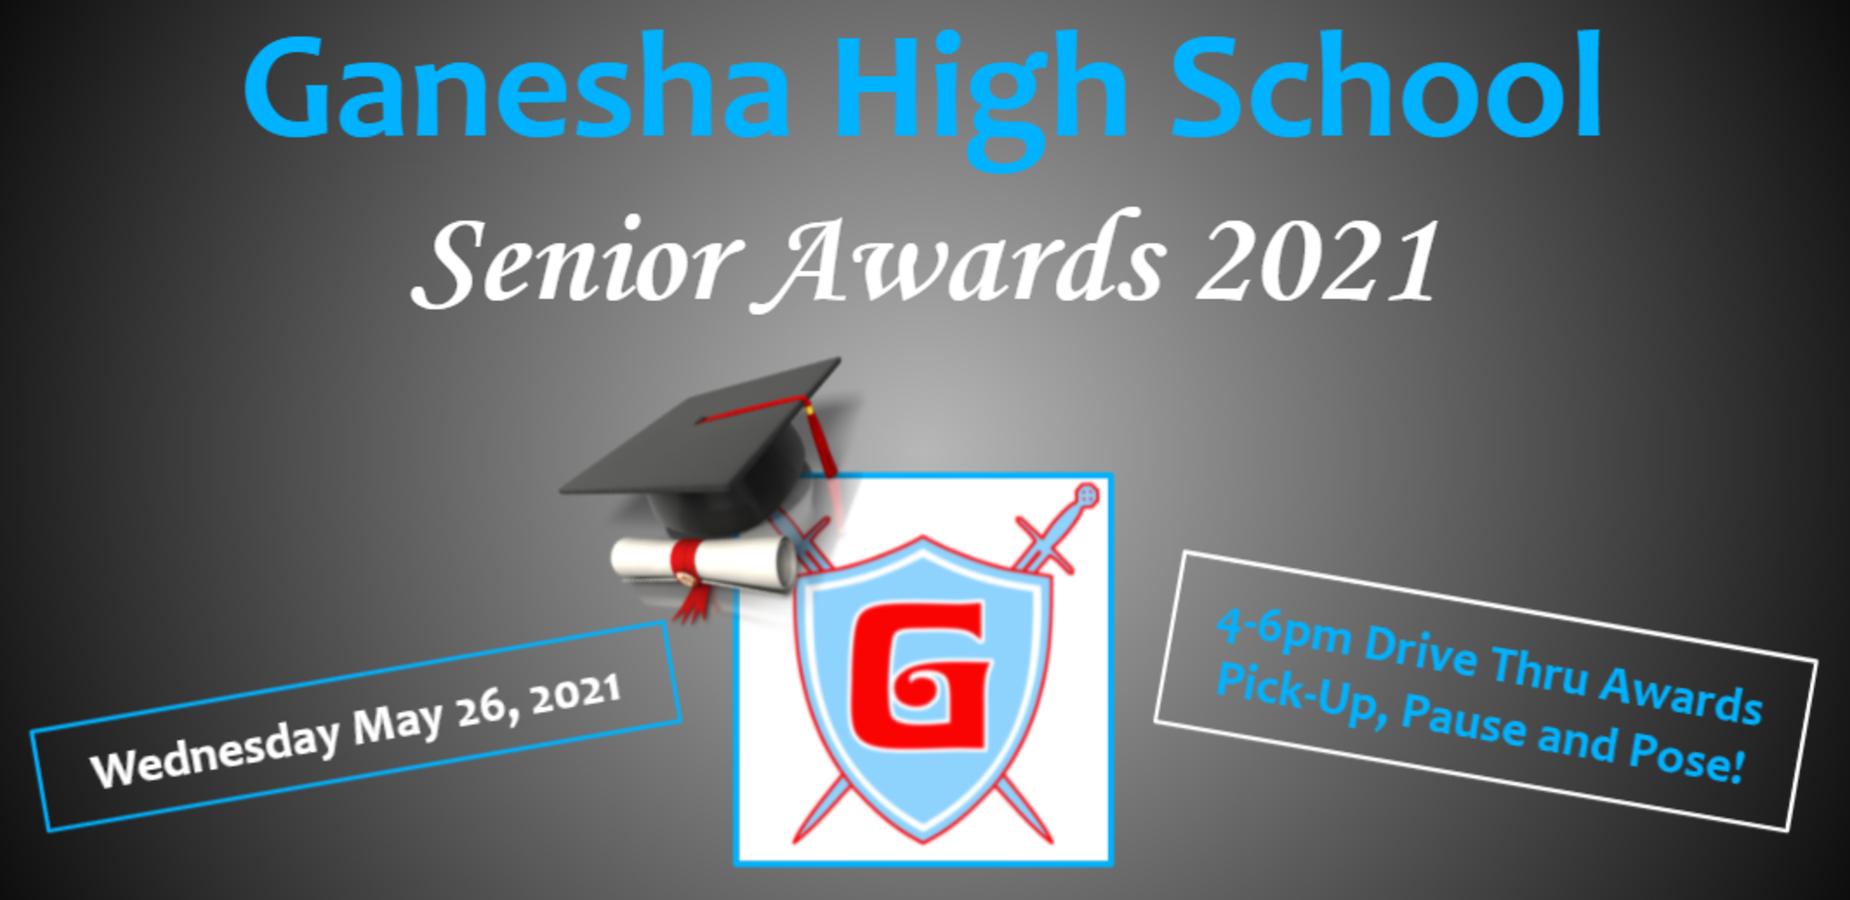 2021 Senior Awards